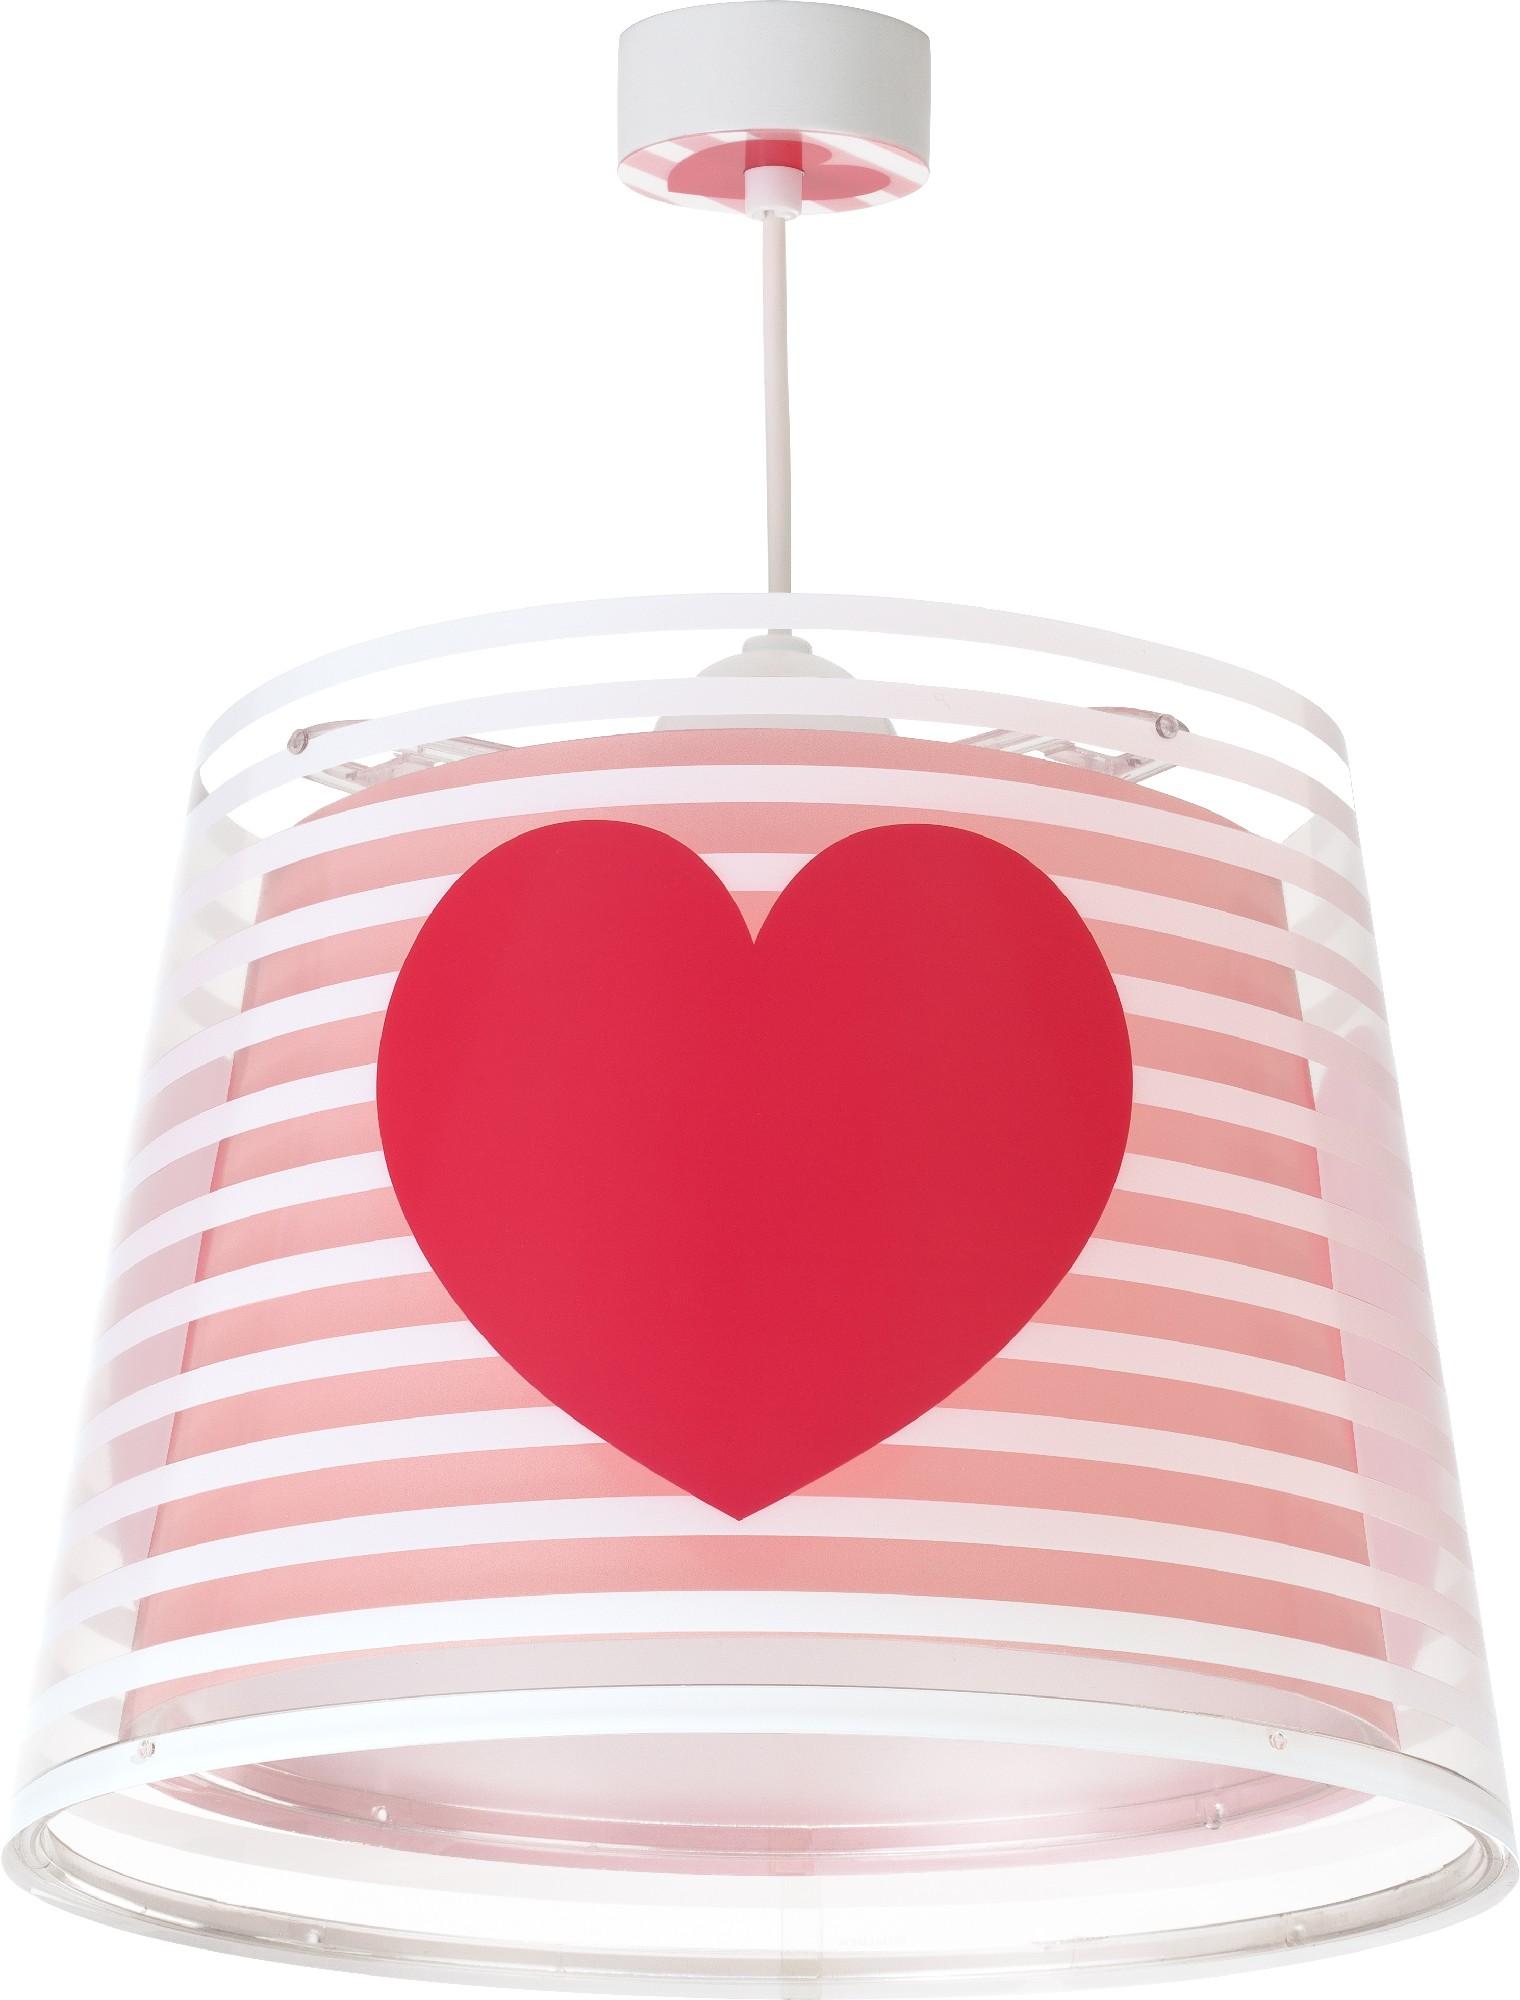 comprar lámparas infantiles de techo